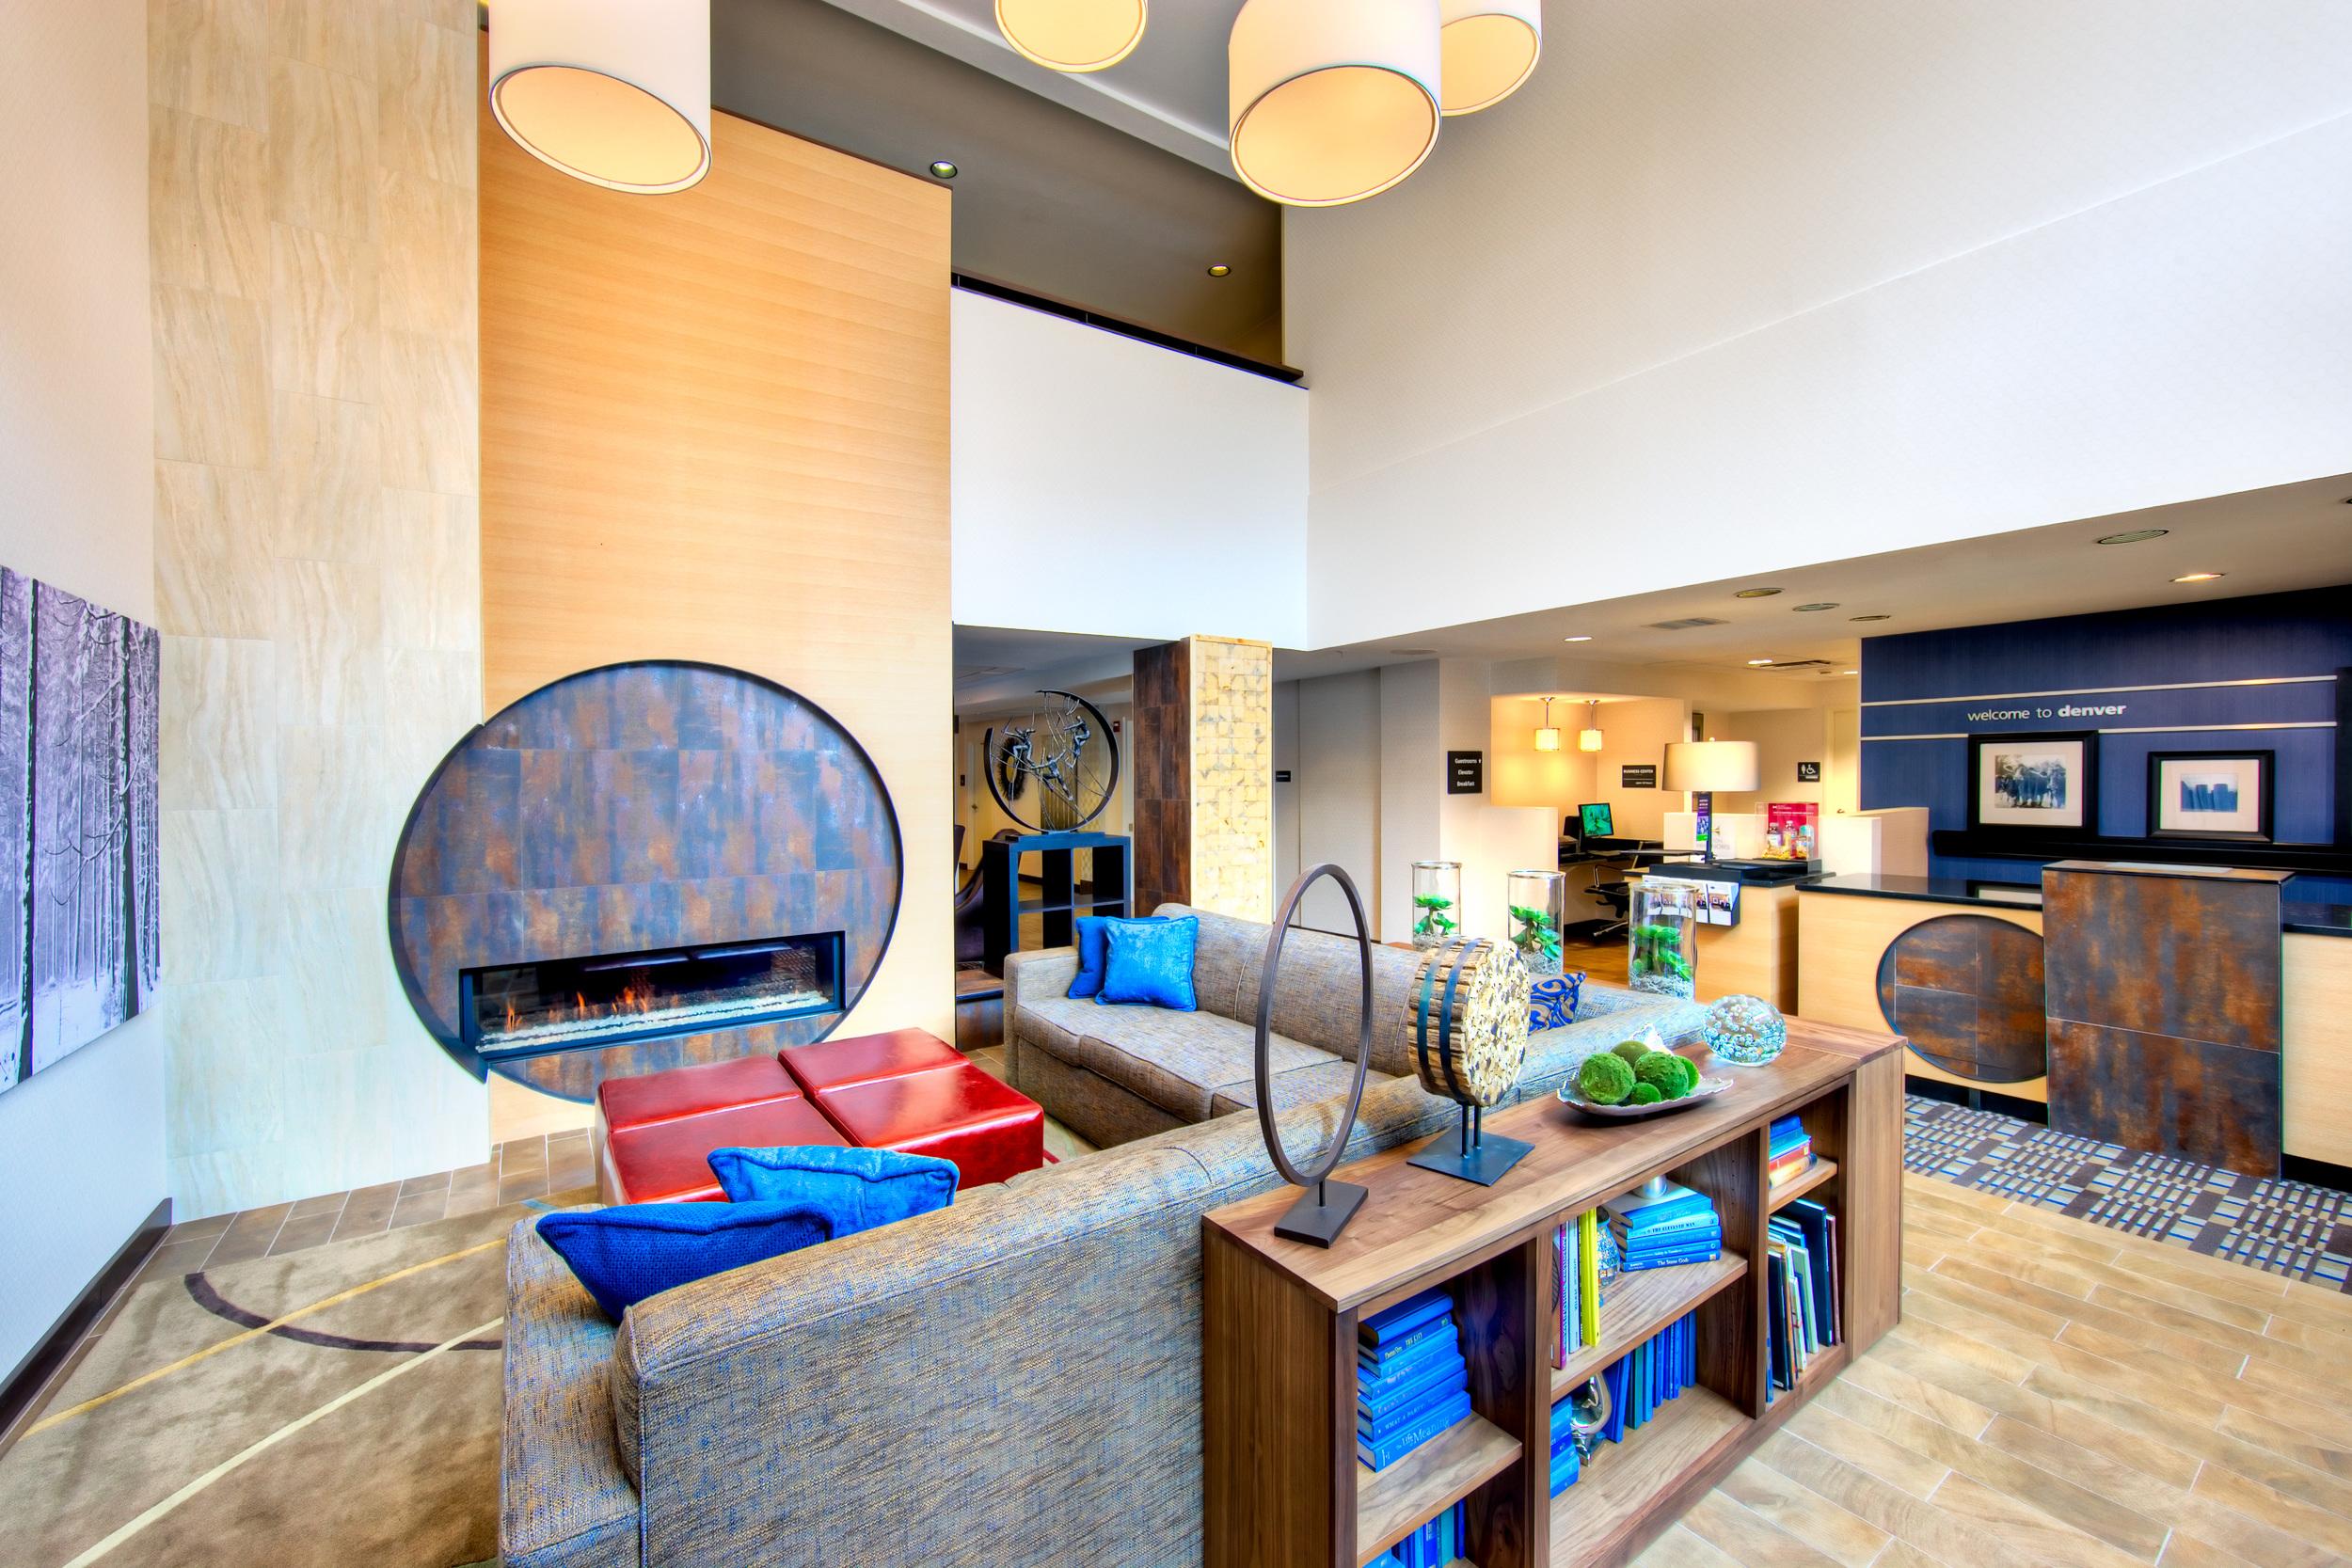 7/Hampton Inn & Suites Tech Center